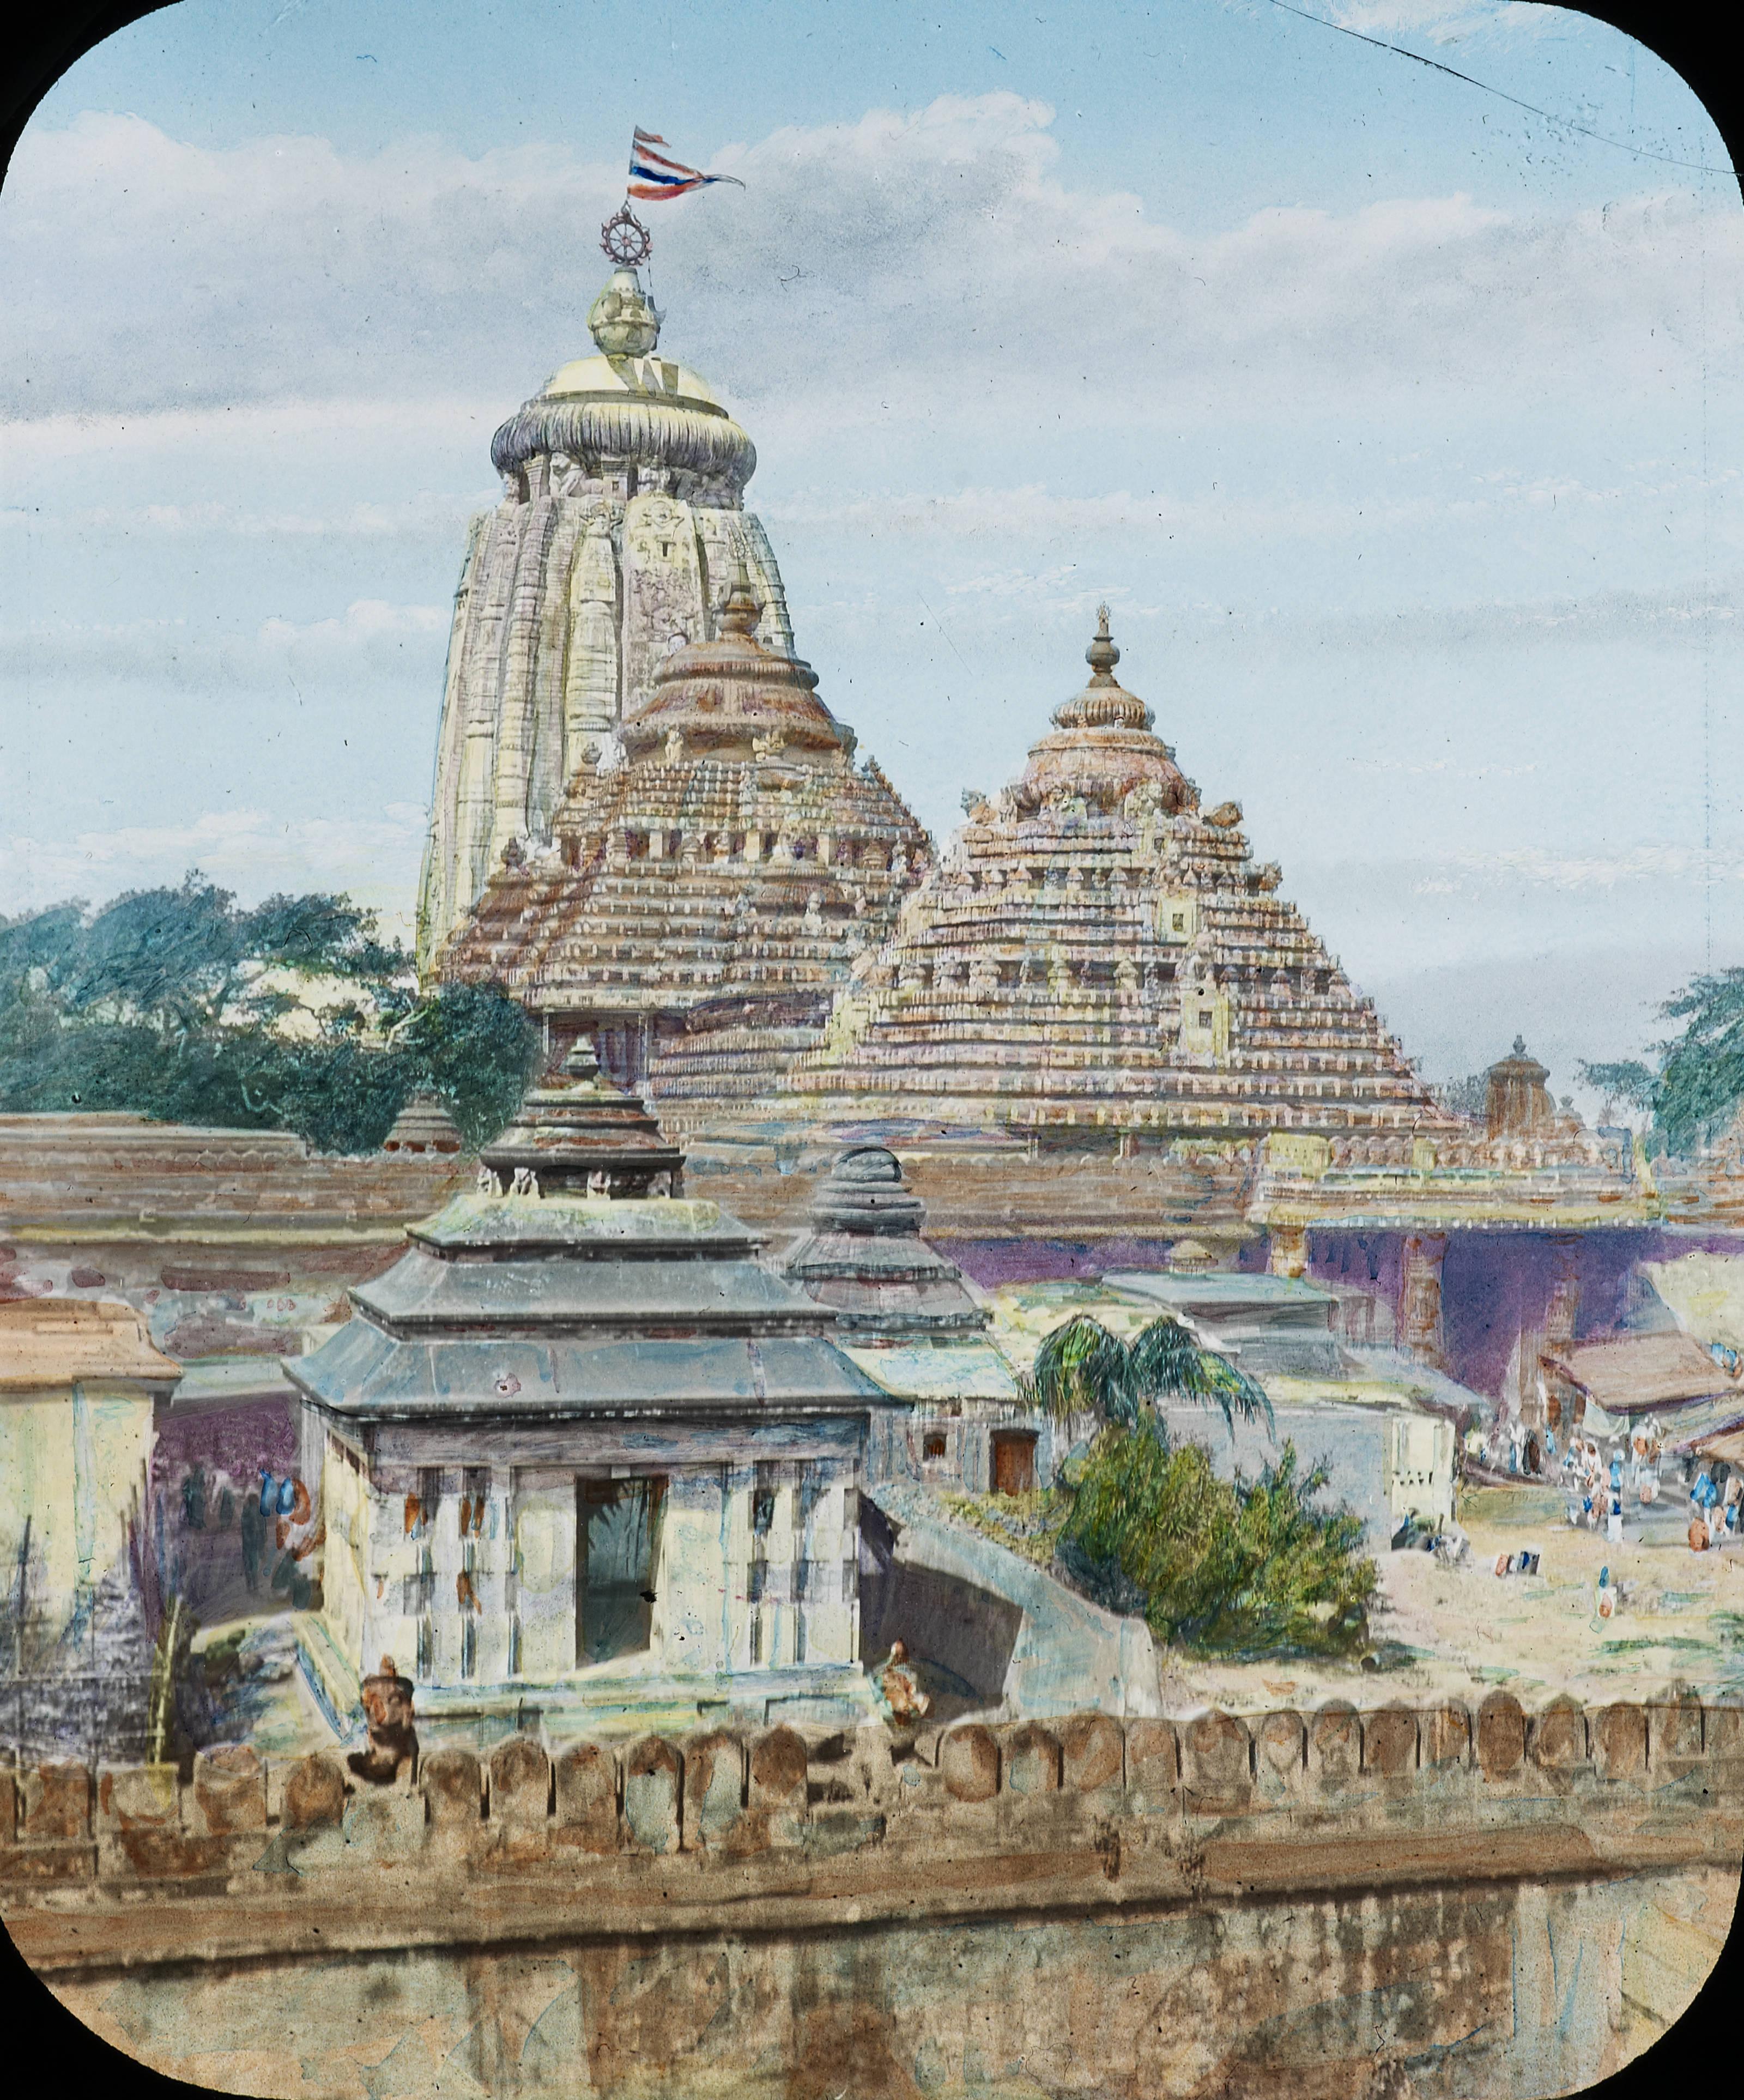 Puri India  city photo : Description Puri, India, ca. 1915 IMP CSCNWW33 OS14 69